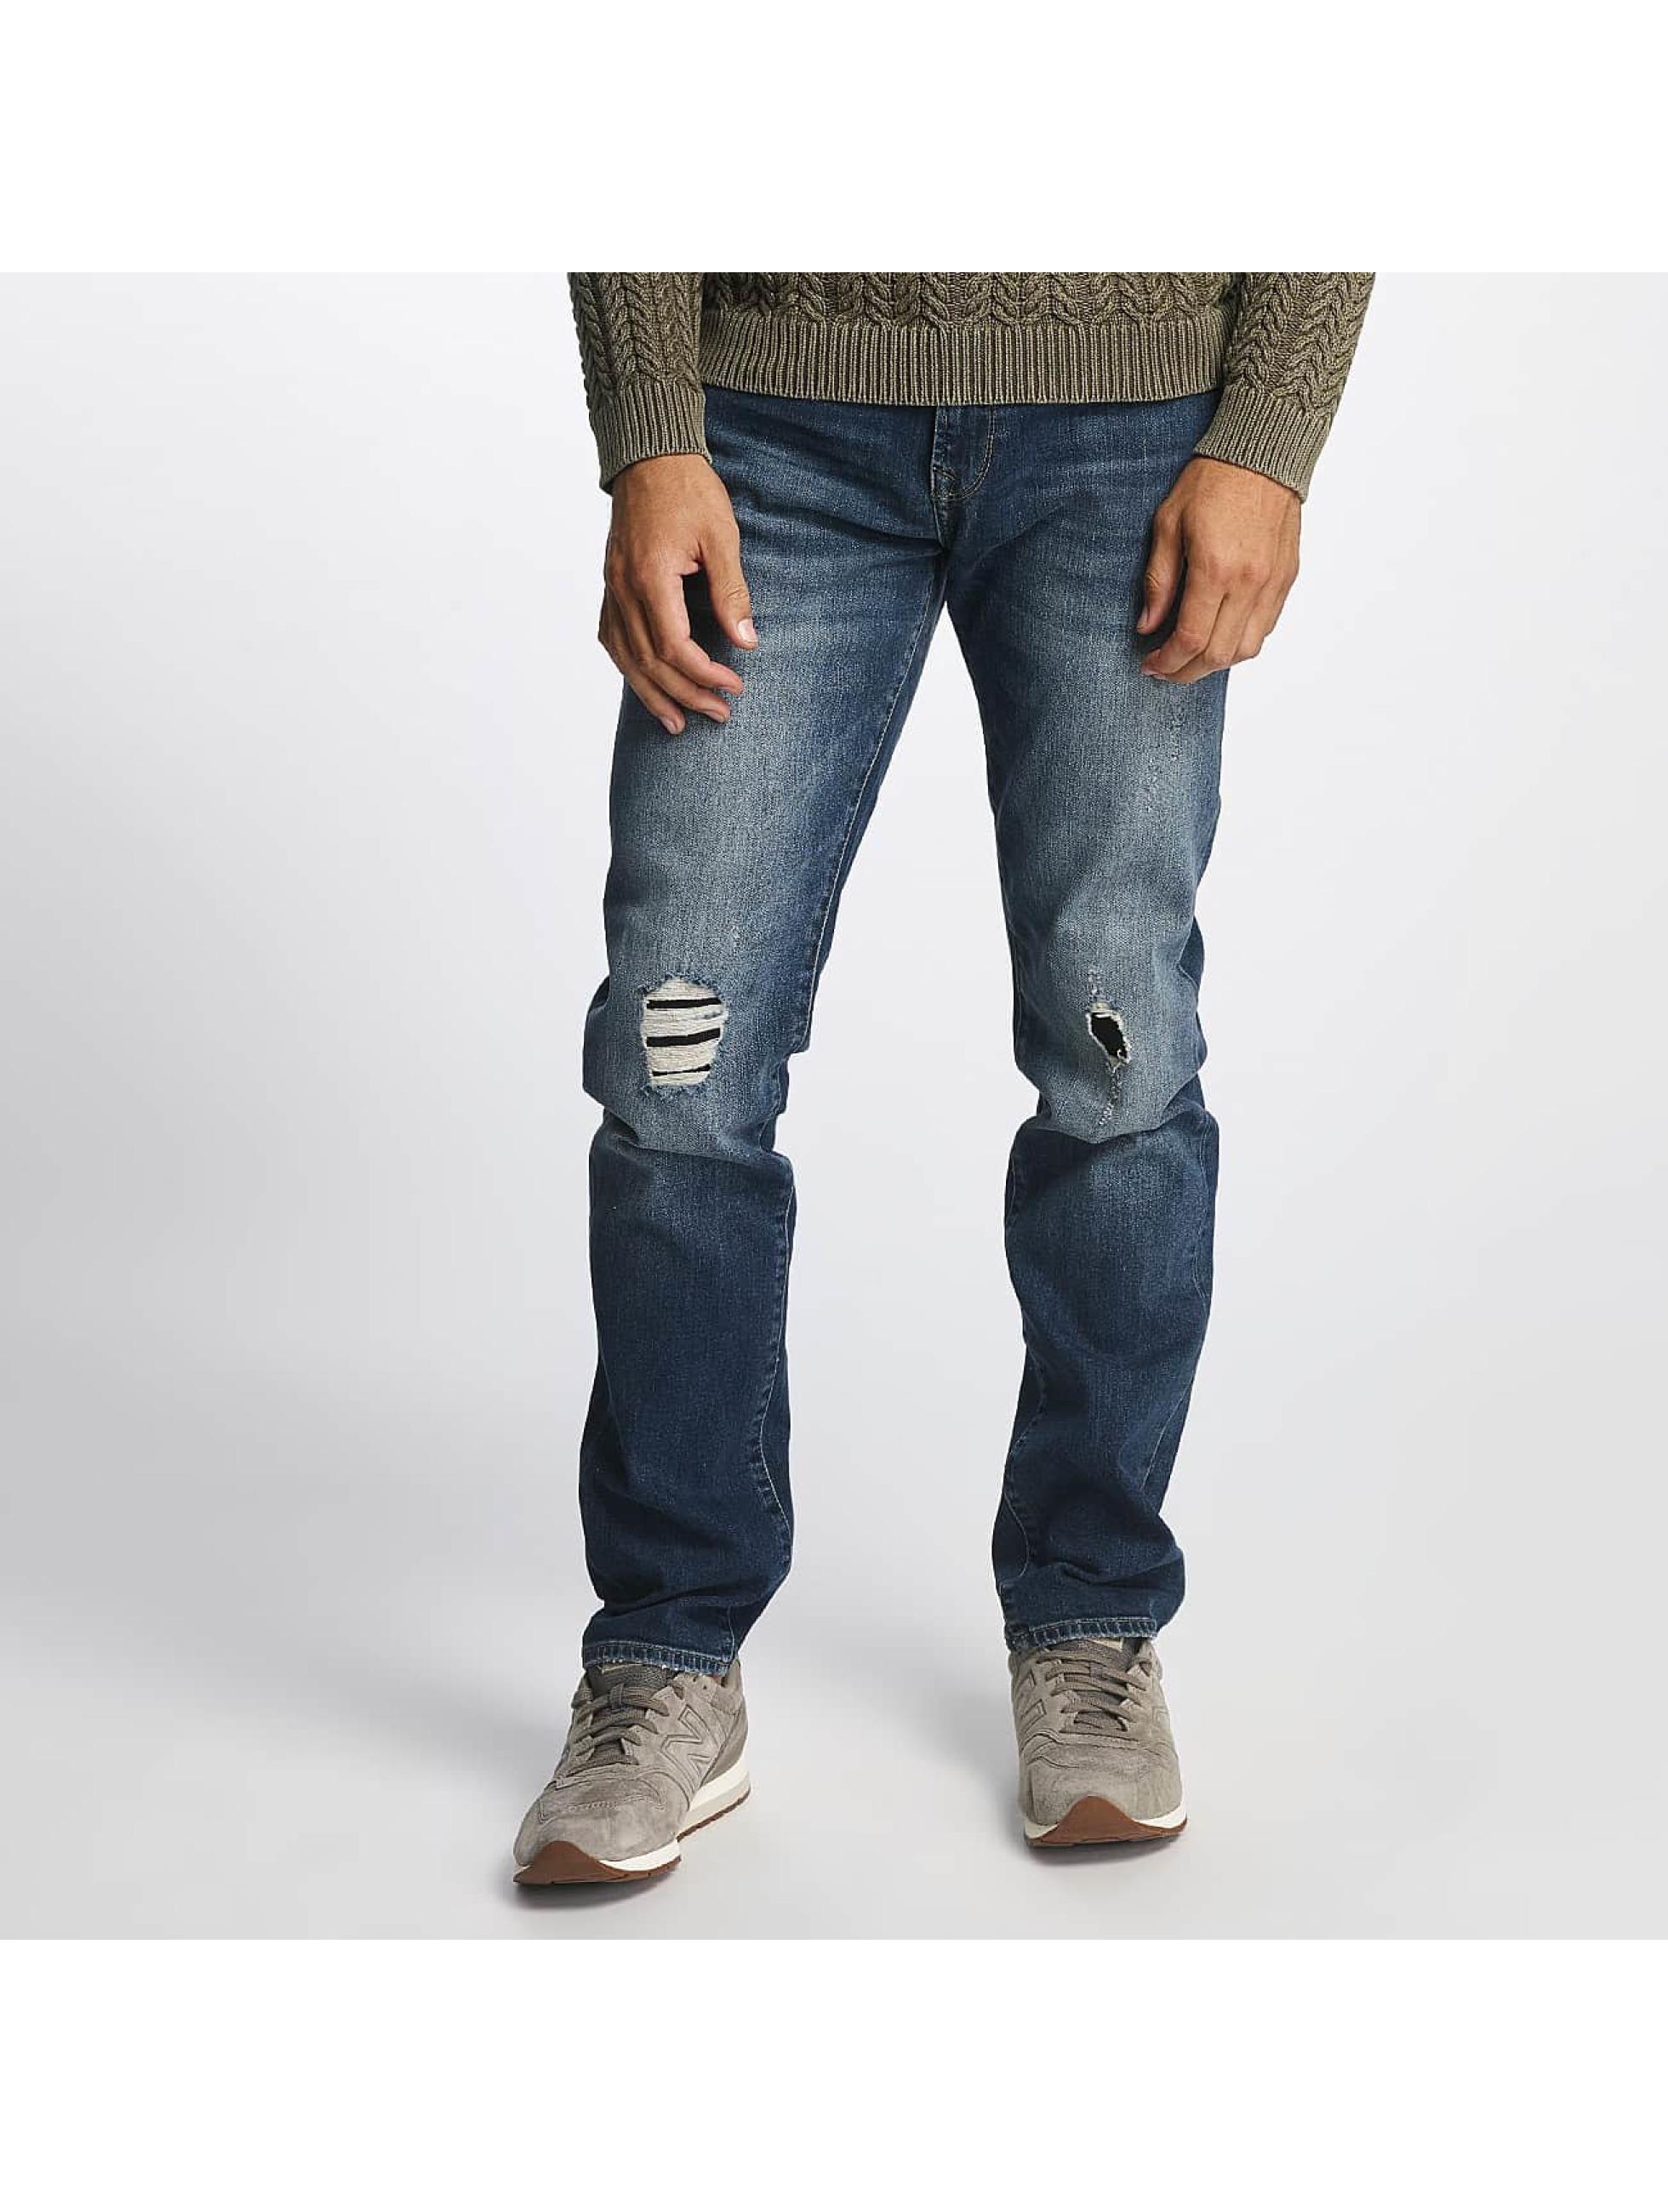 Mavi Jeans Männer Slim Fit Jeans Marcus in blau